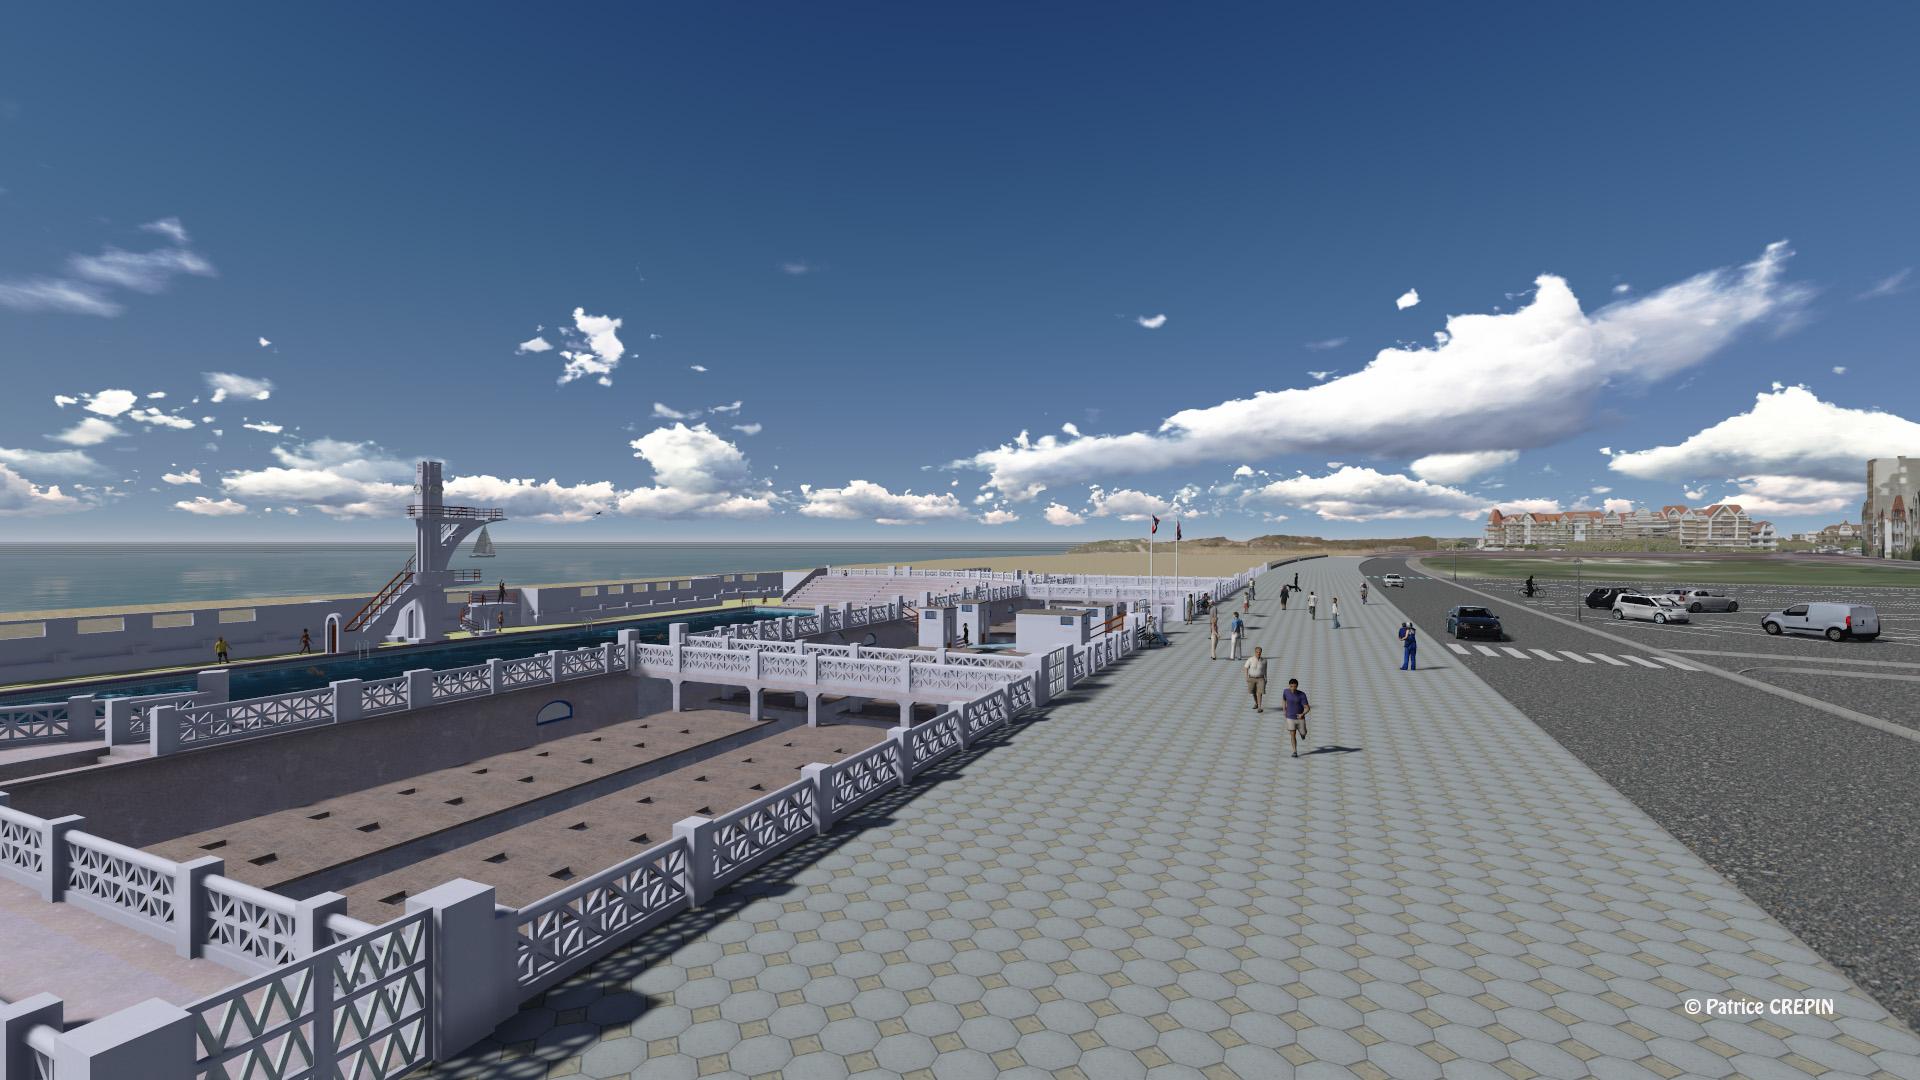 Fiat lux fiat urbs for Construction piscine 25m